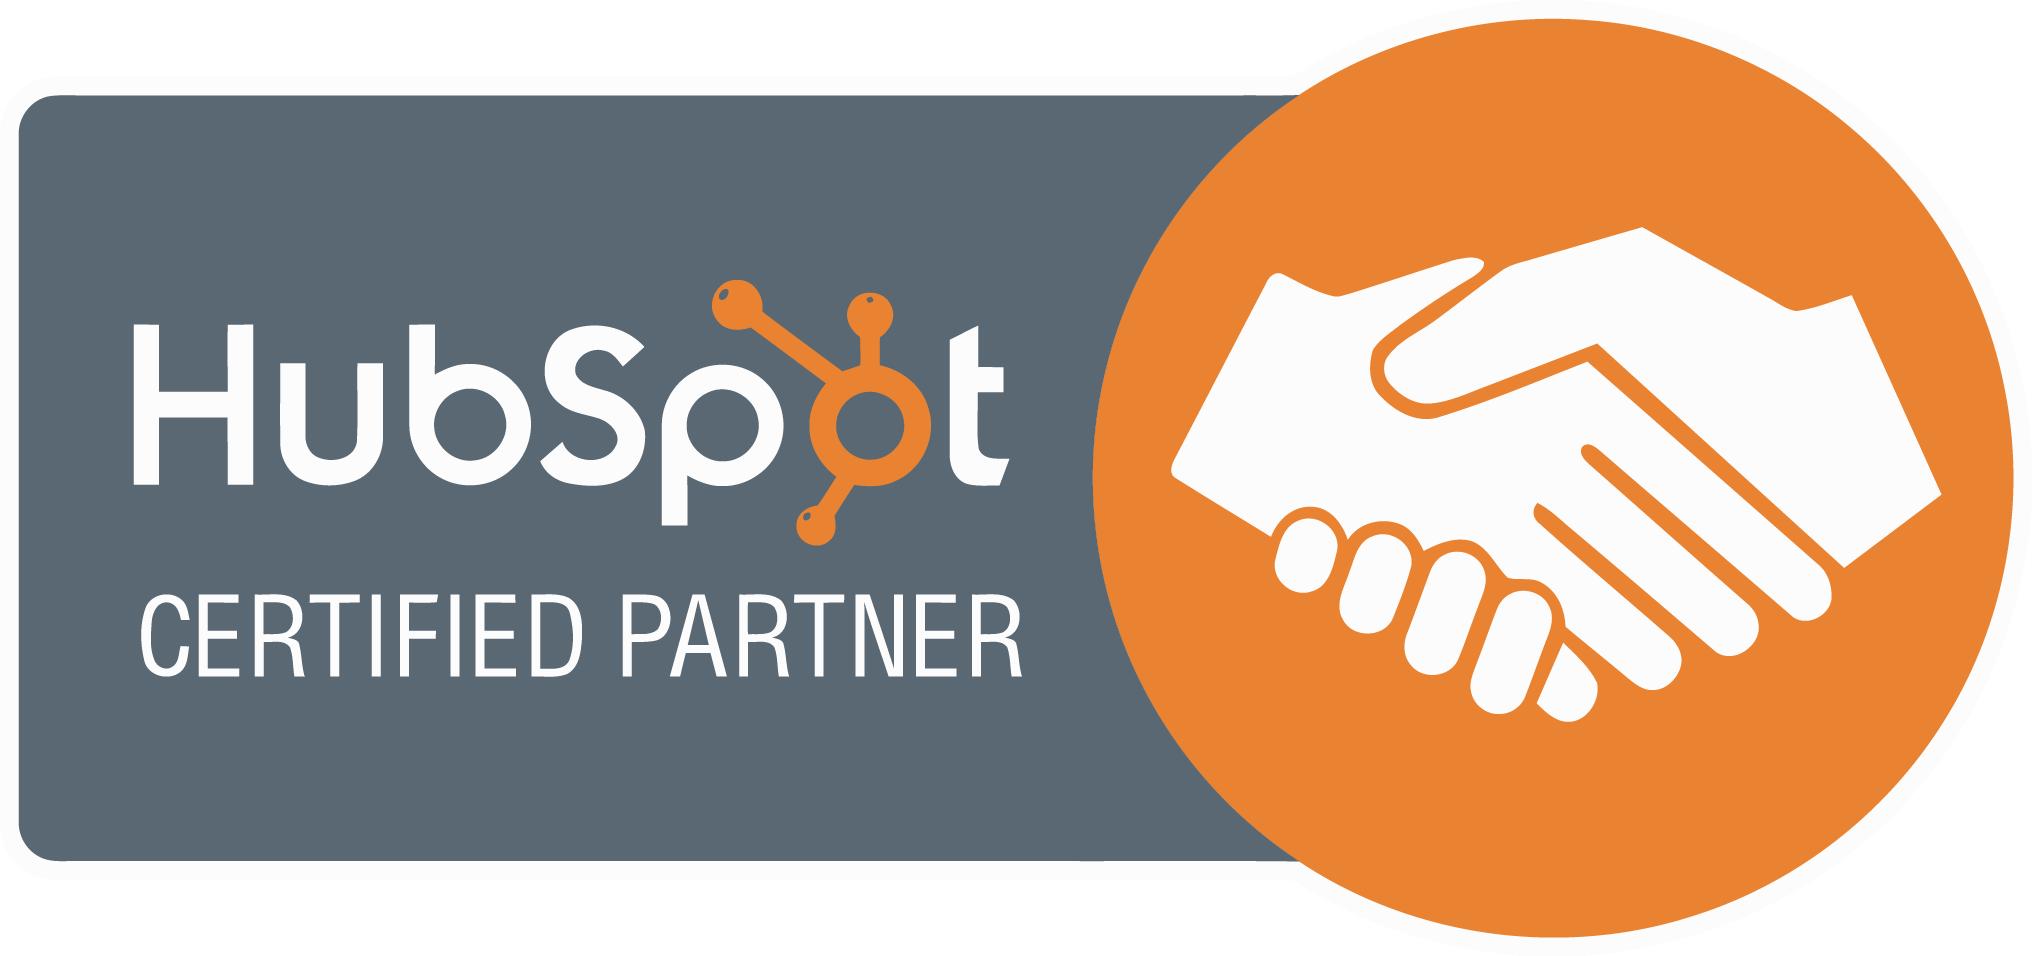 hubspot-certified-partner-logo-1.png